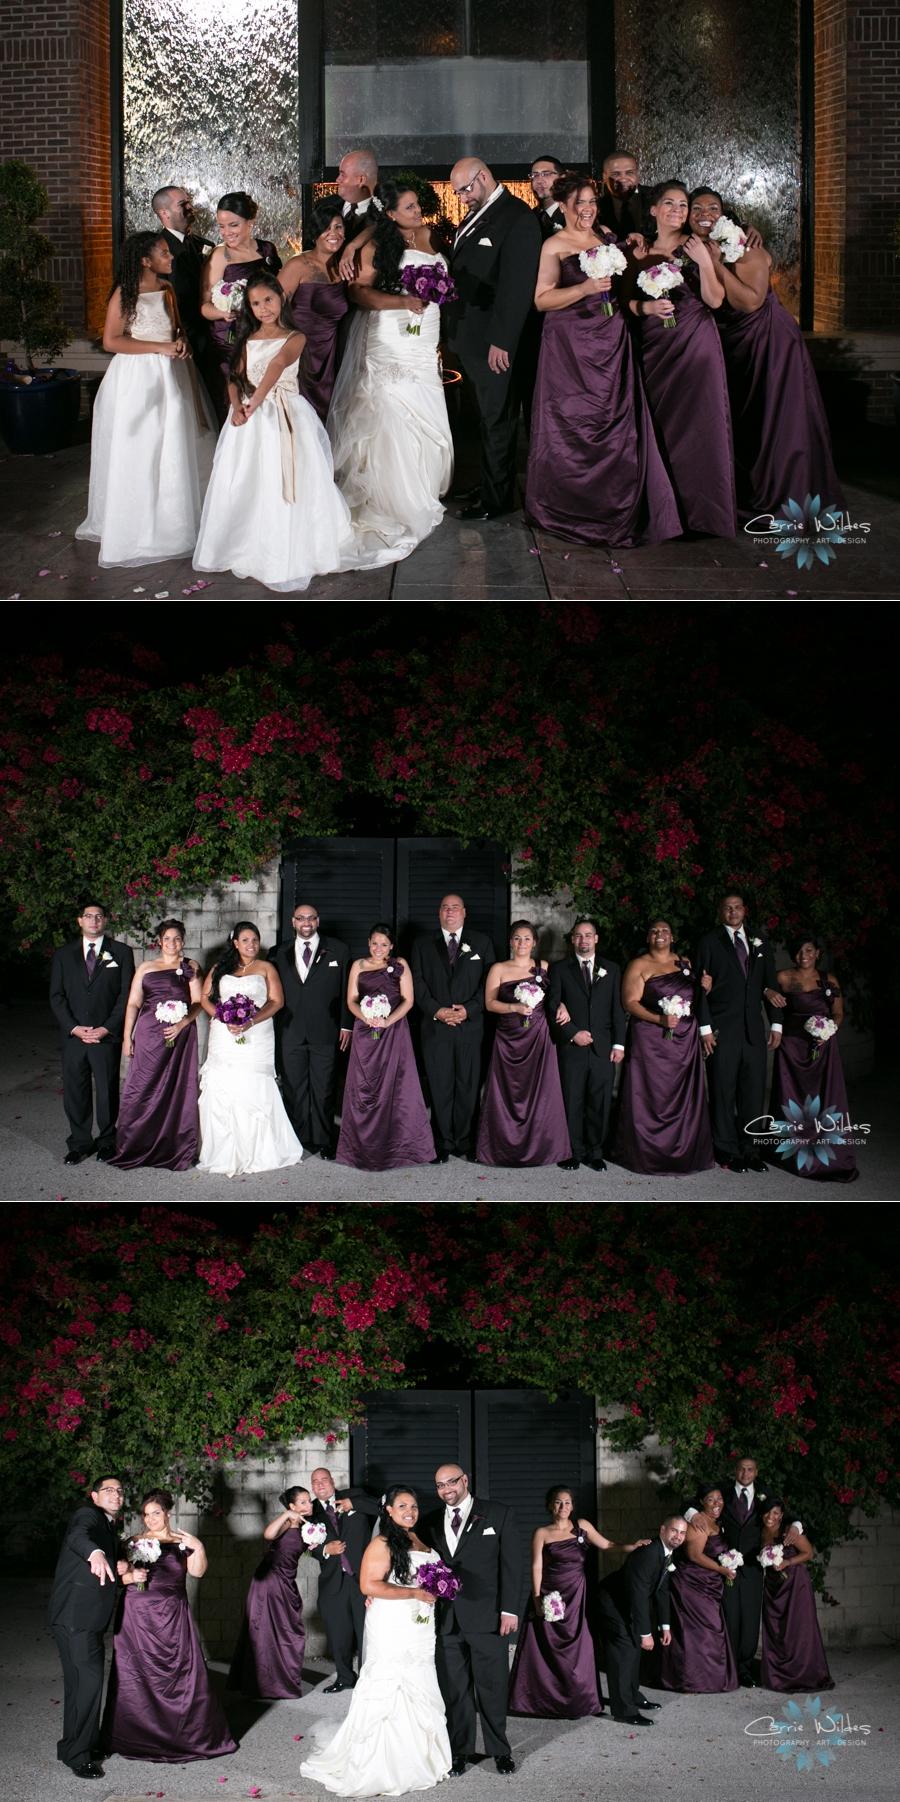 11_22_13 Pepin Hospitality Center Wedding_0008.jpg